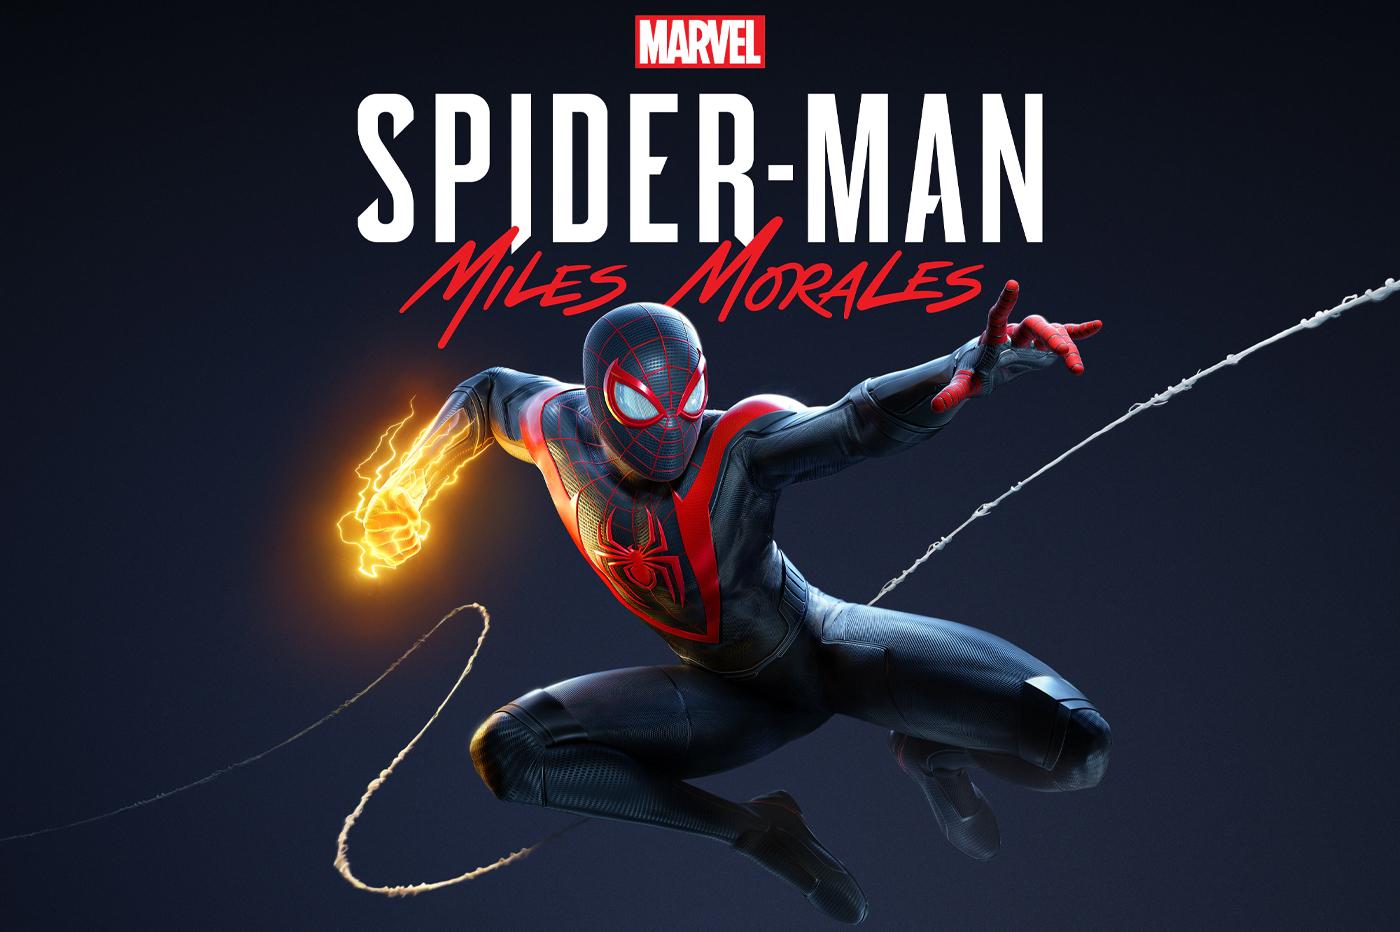 Marvel's Spider-Man: Miles Morales; Marvel; Spider-Man;